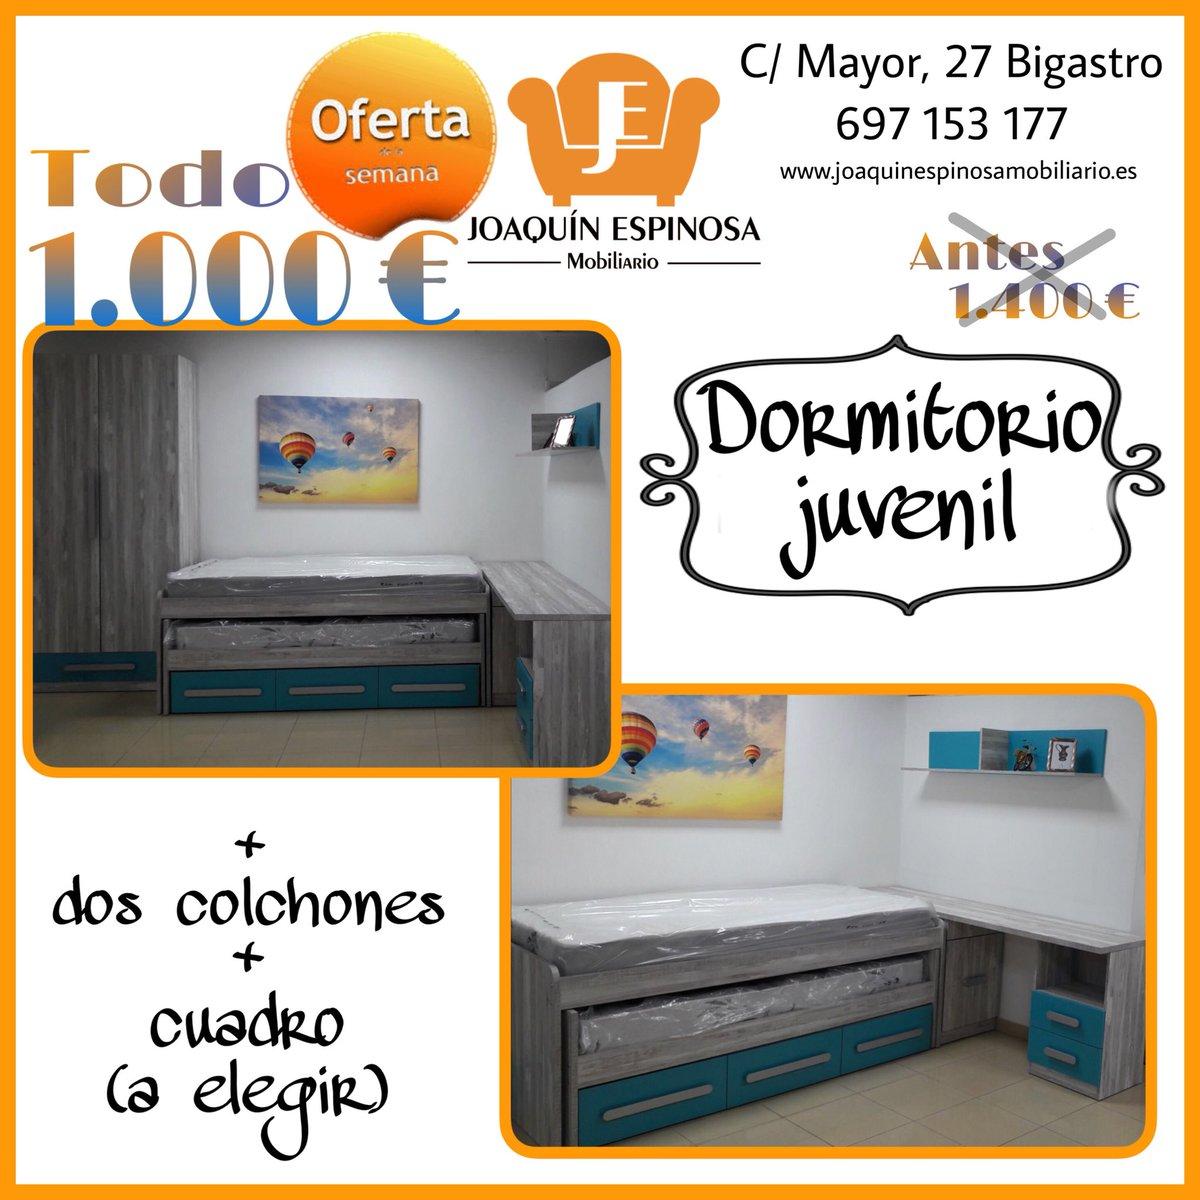 Muebles Joaquin Espinosa - Joaqu N Espinosa Mobiliario Jemobiliario Twitter[mjhdah]https://lookaside.fbsbx.com/lookaside/crawler/media/?media_id=369130523540547